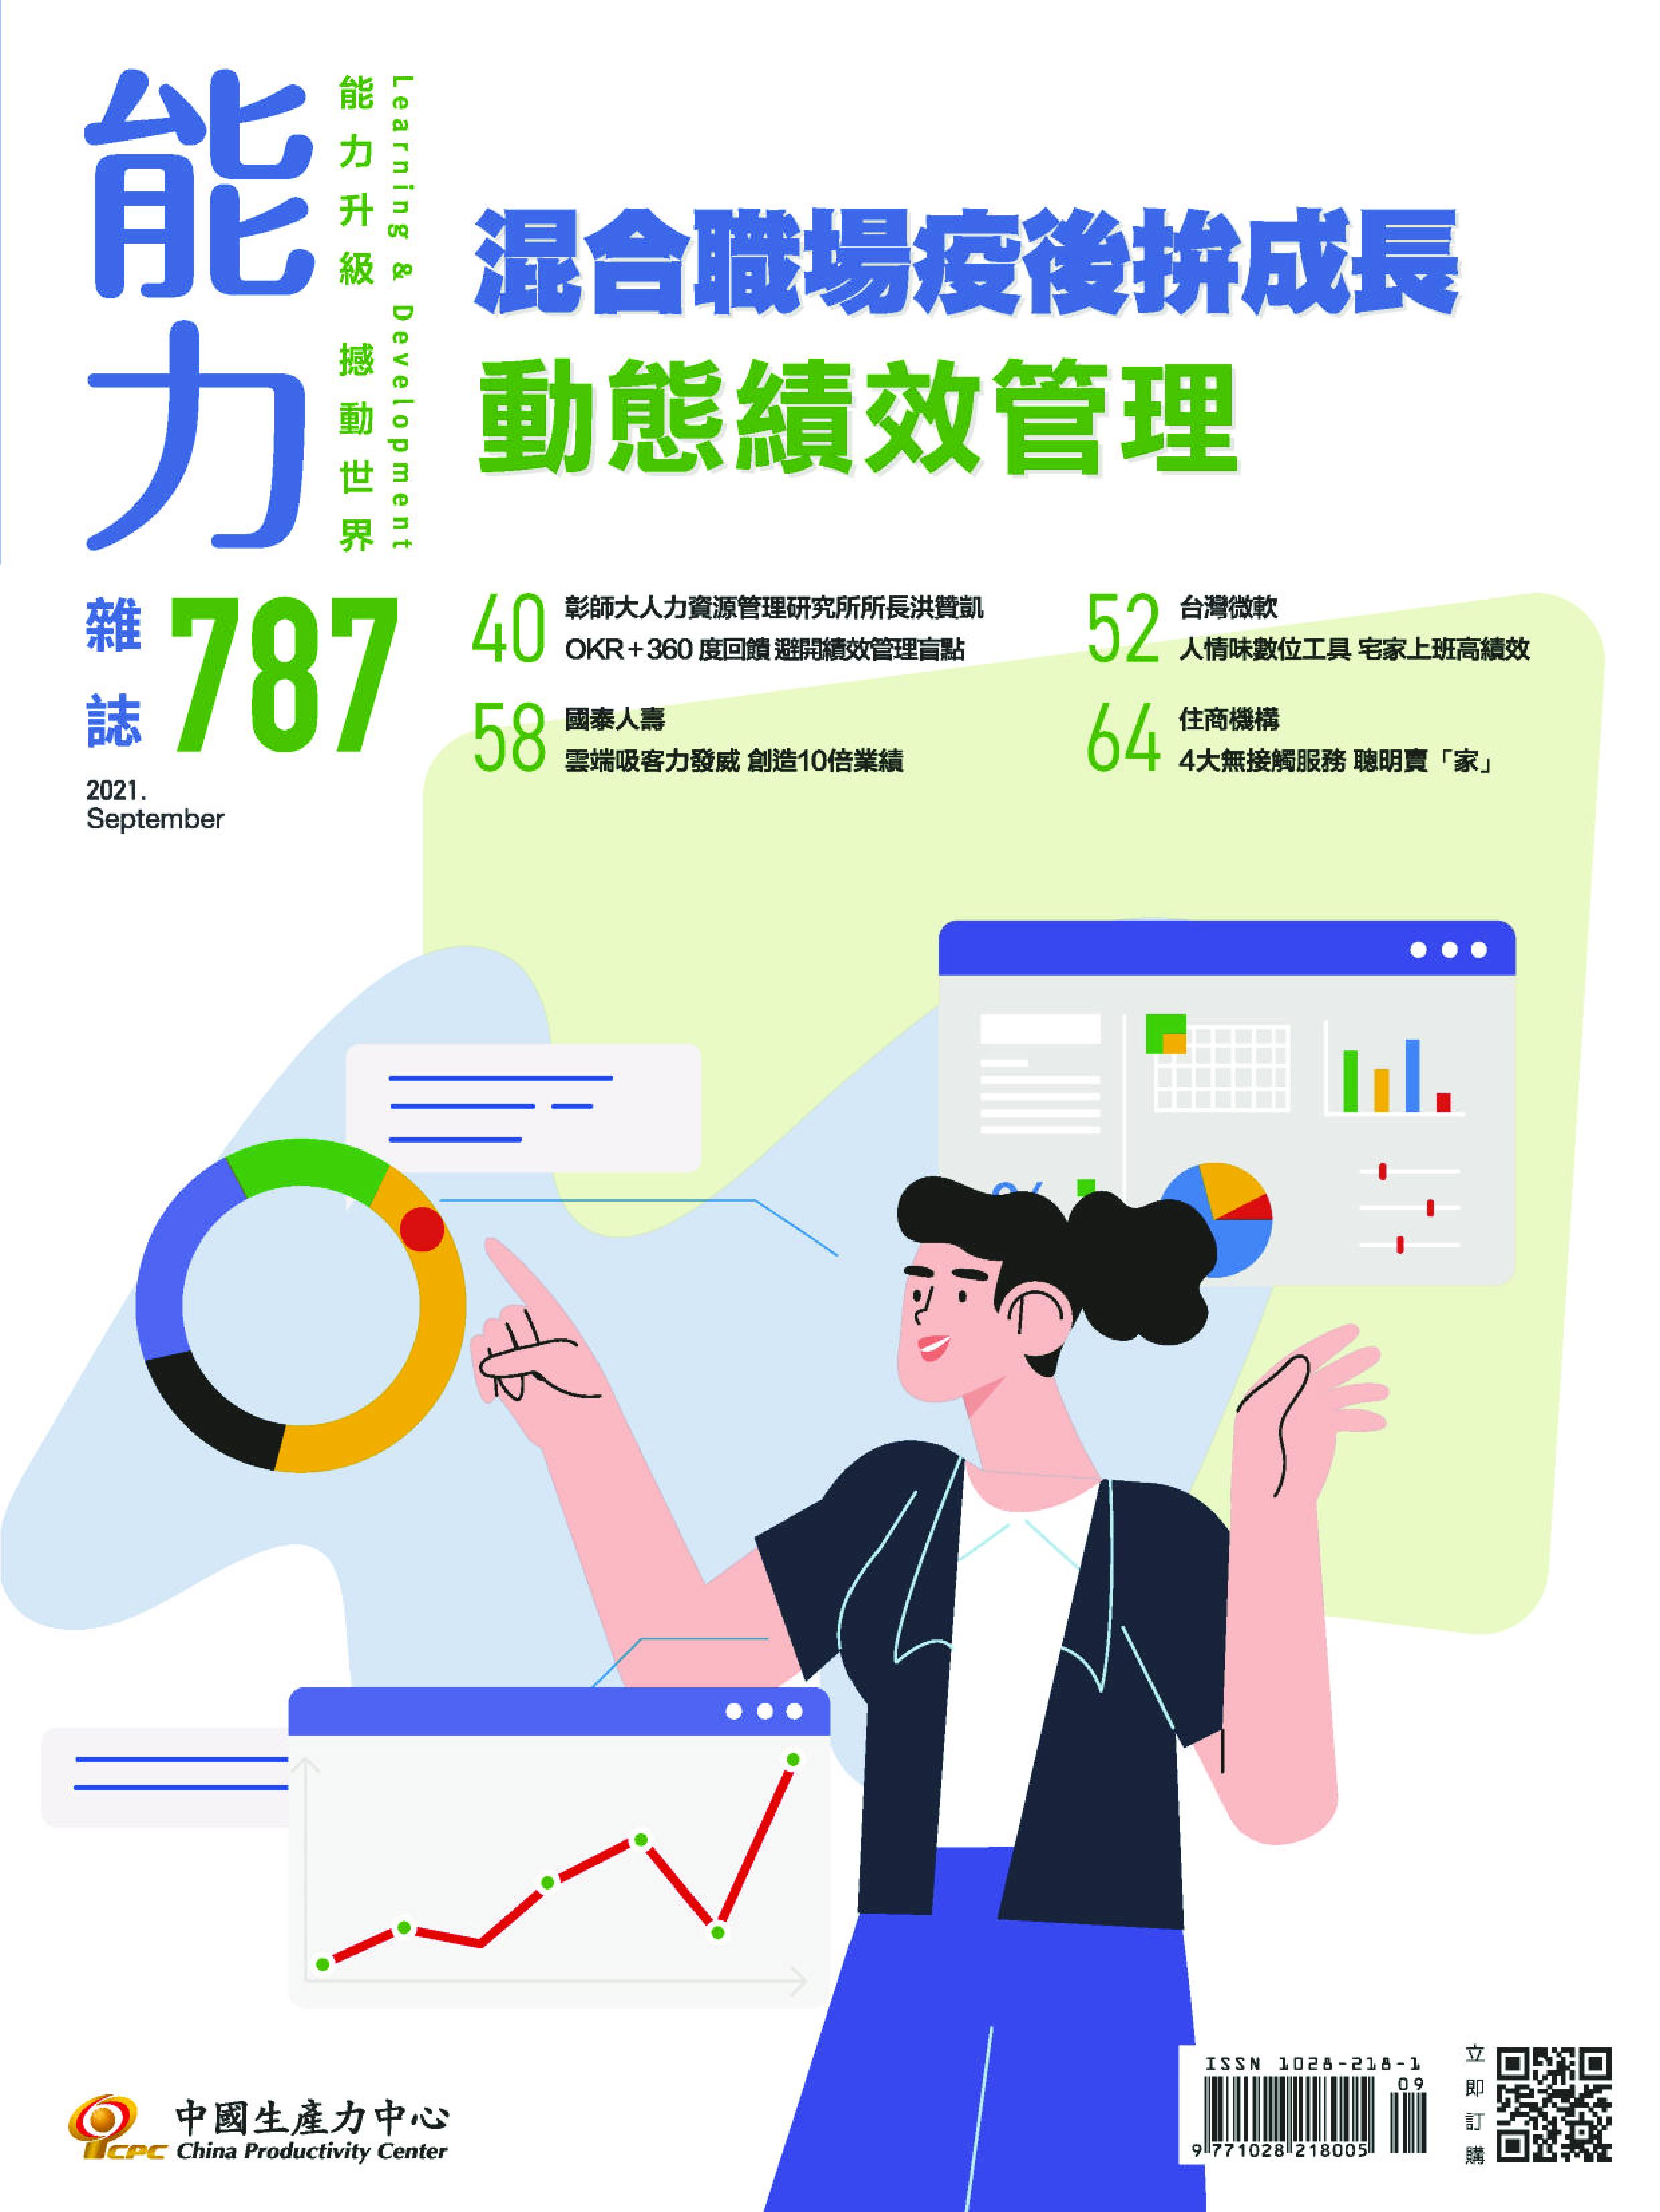 Learning & Development Monthly 能力雜誌 - 九月 2021